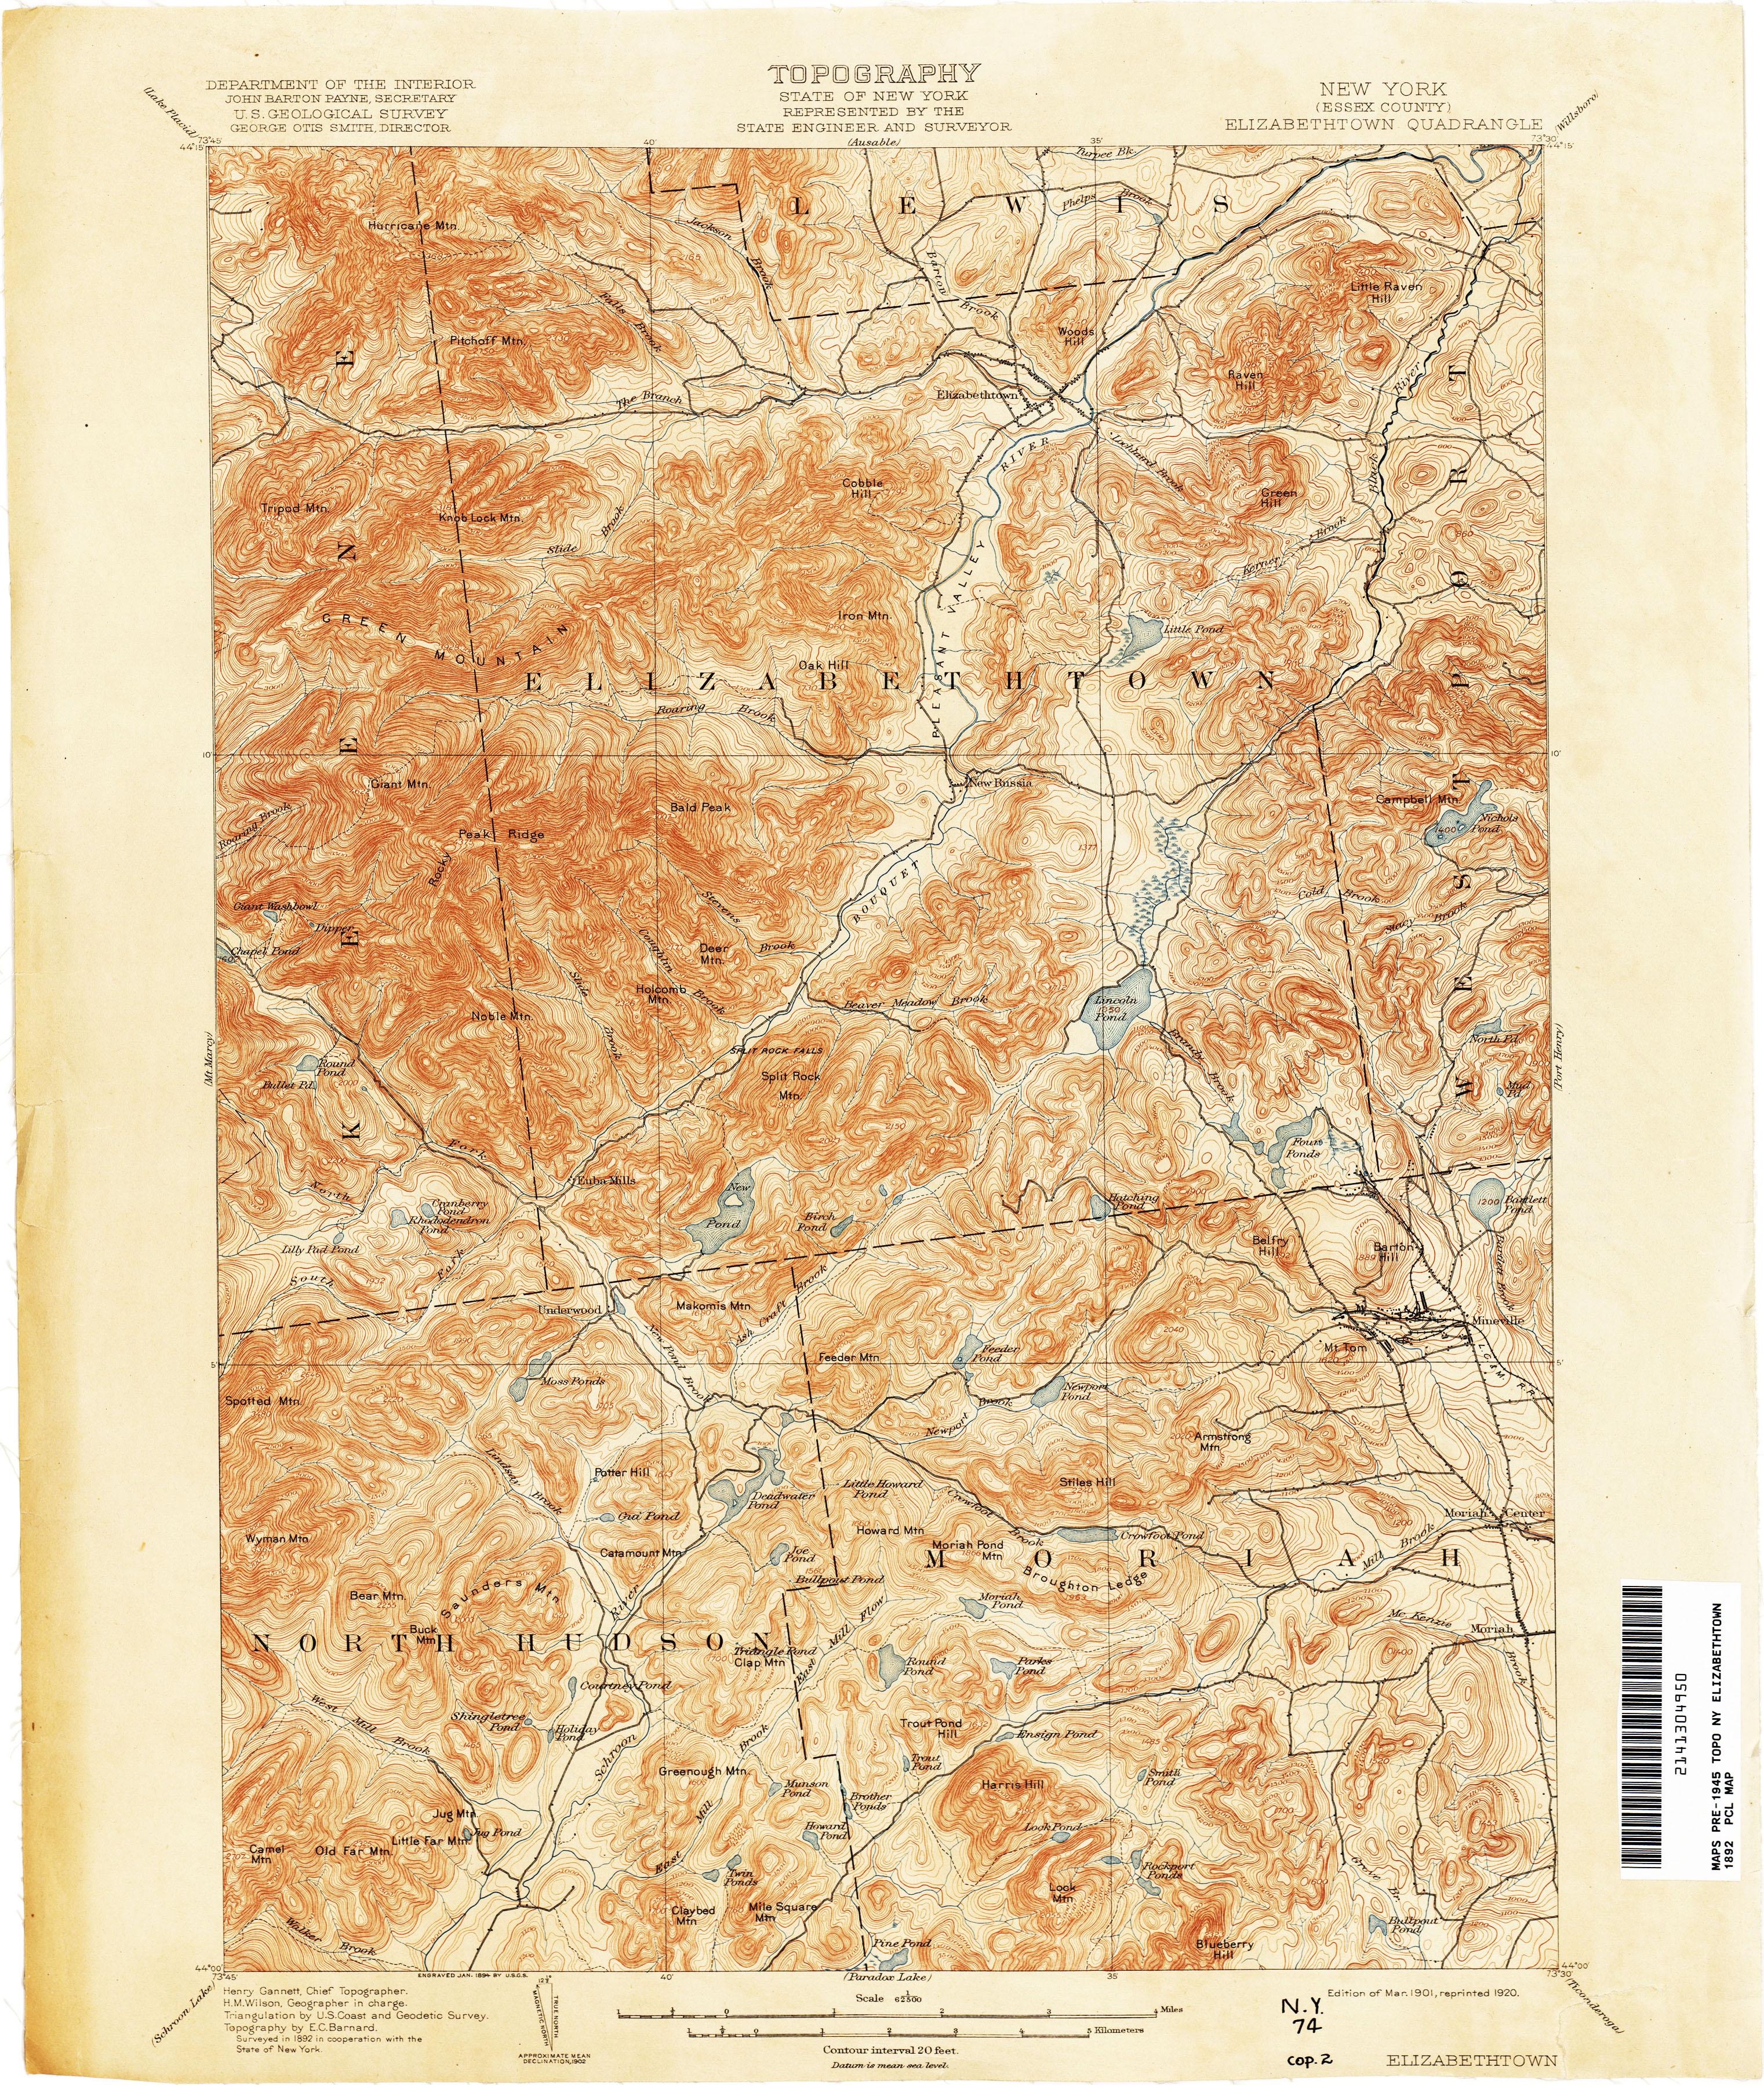 FileElizabethtown New York USGS topo map 1892jpg Wikimedia Commons